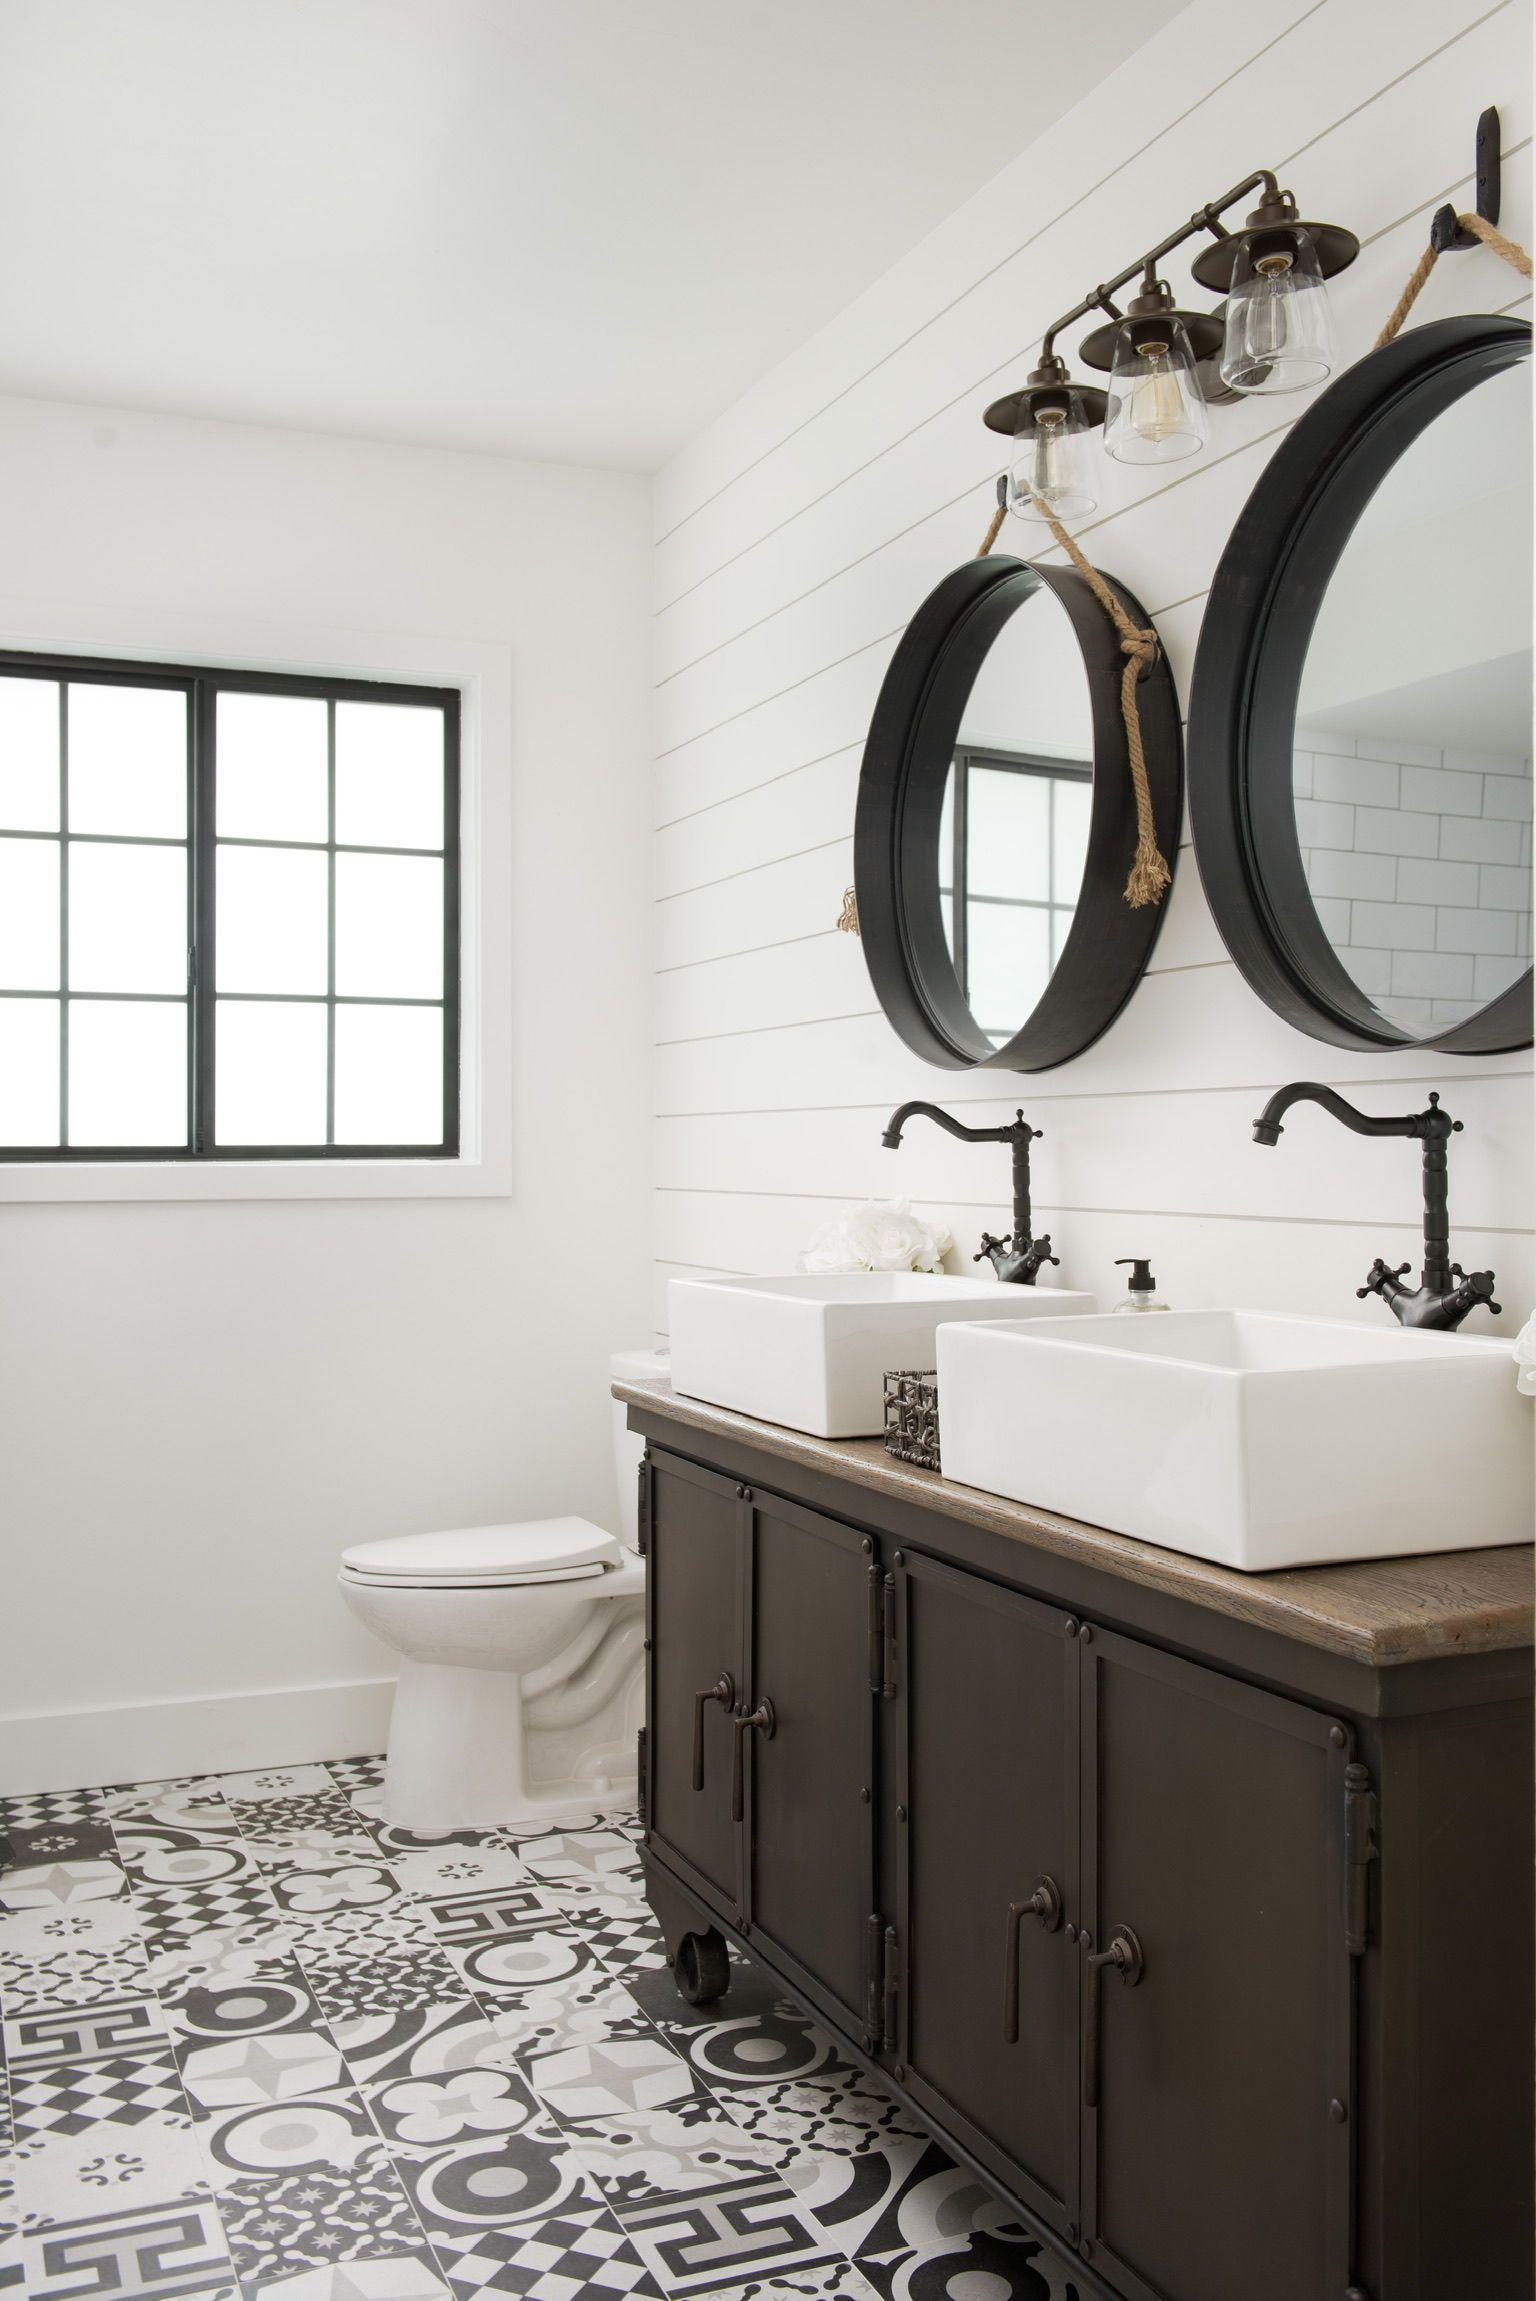 Farmhouse Bathroom Ideas Inspired By Joanna Gaines White Shiplap Backsplash Bathroom Farmhouse Style Farmhouse Bathroom Decor Farmhouse Style Bathroom Decor